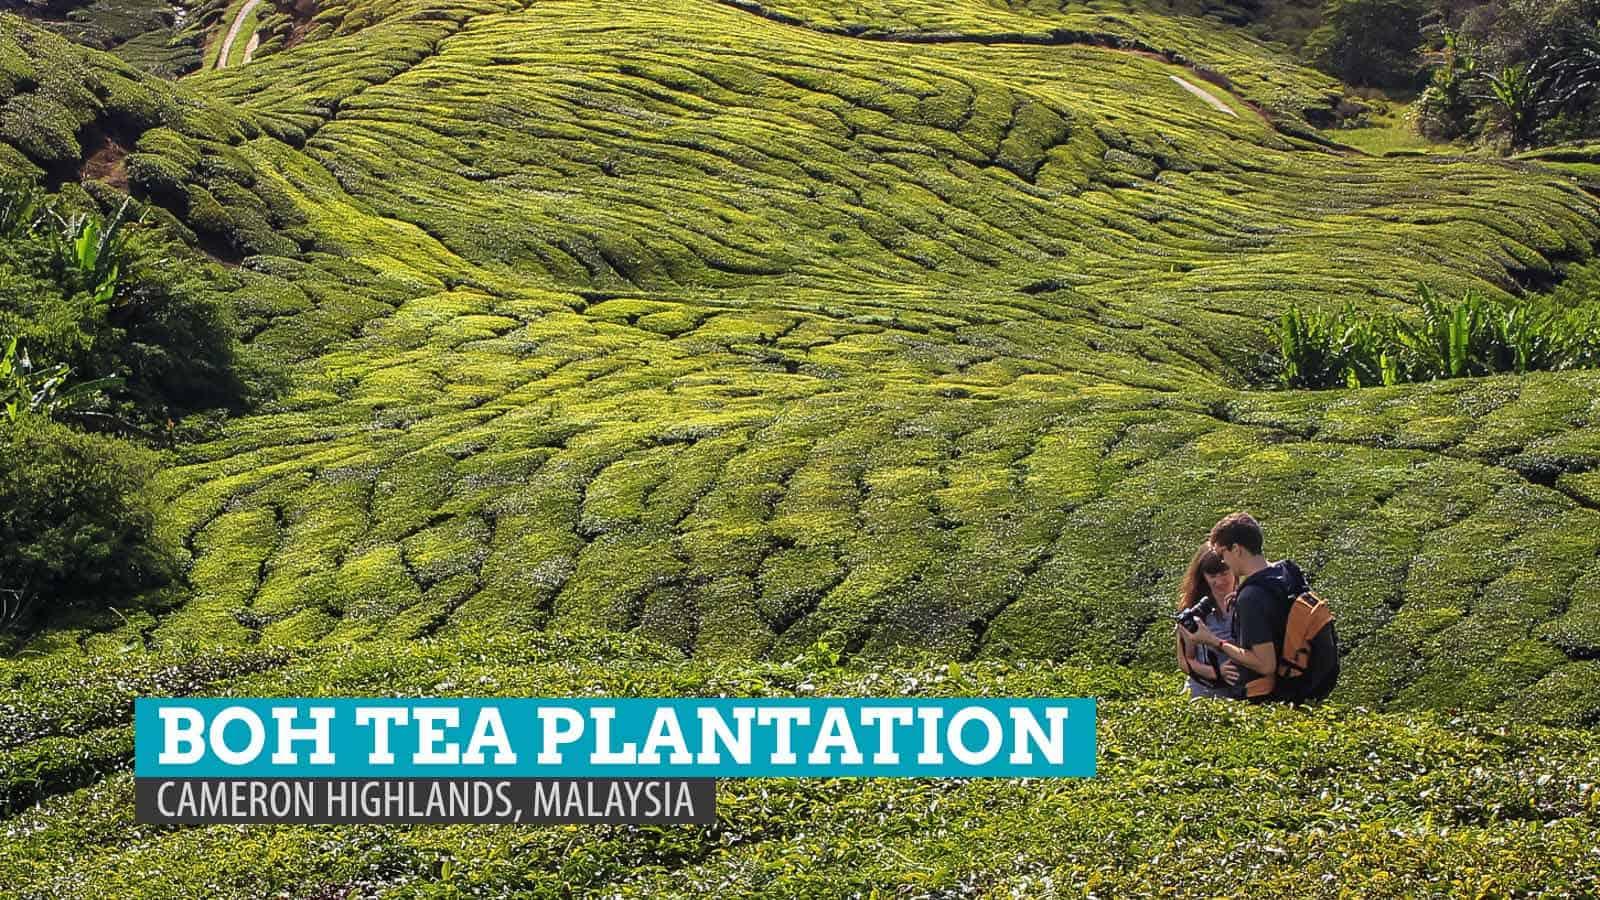 BOH Tea Plantation: My Cup of Tea in Cameron Highlands, Malaysia